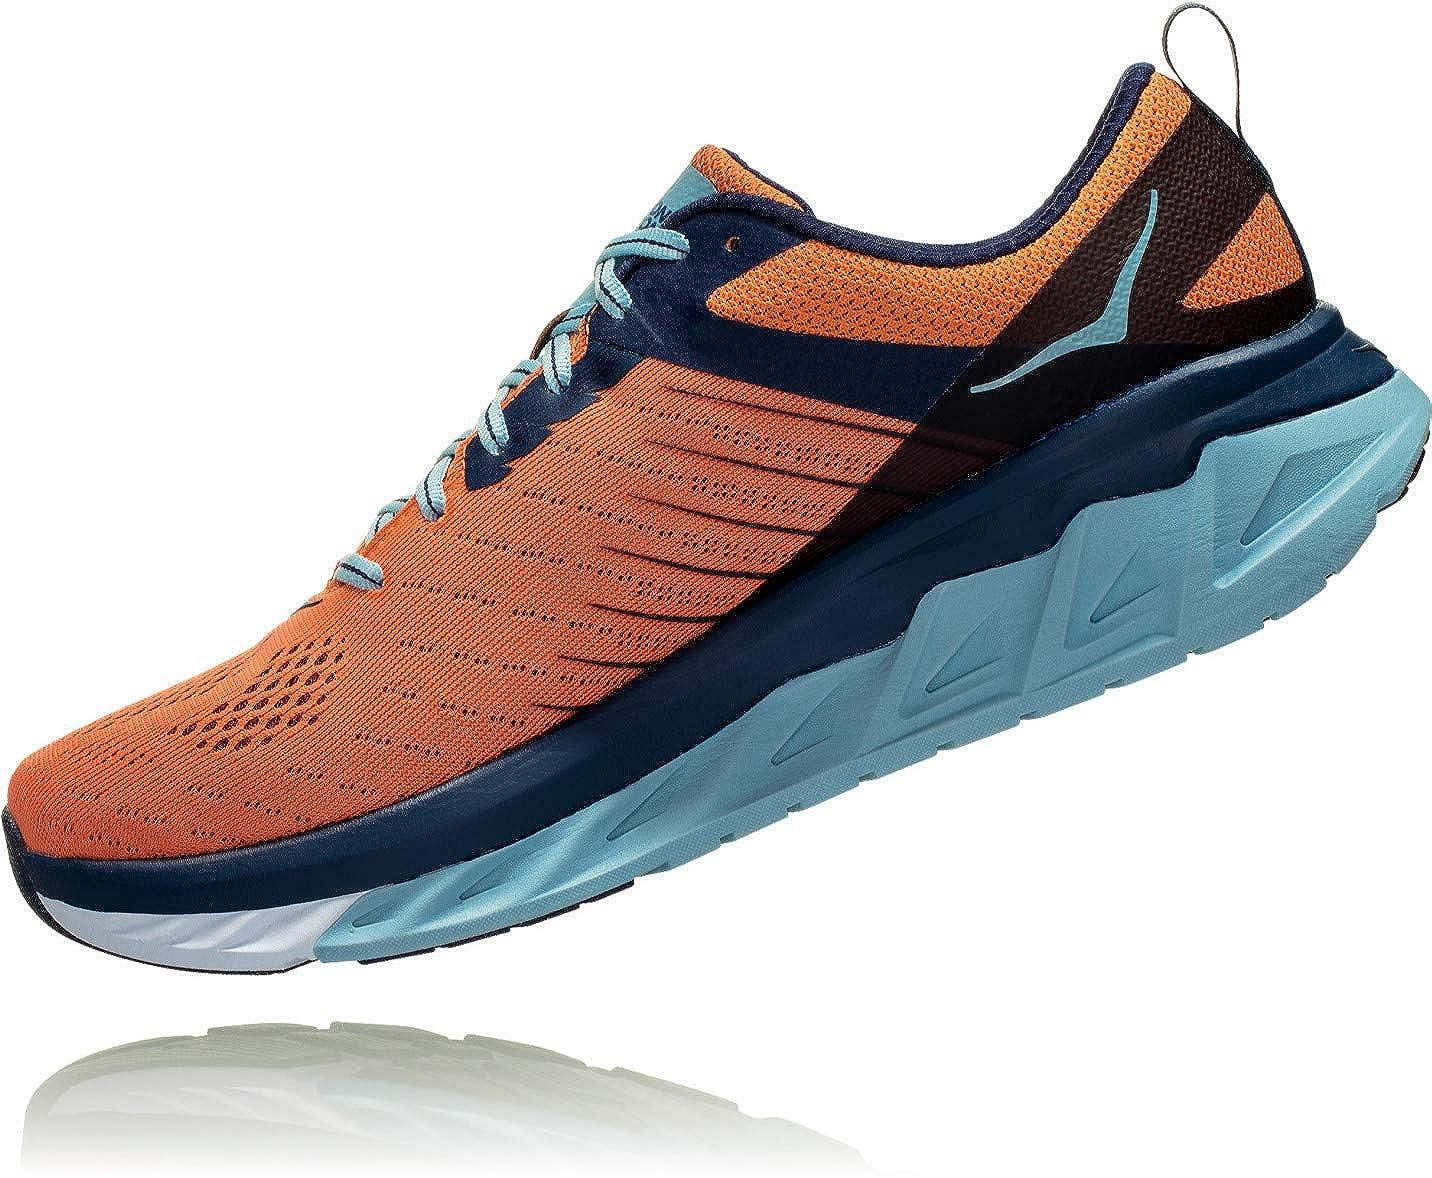 Hoka One One Arahi 3 Running schuhe schuhe schuhe Men Nasturtium Patriot Blau 2019 Laufsport Schuhe b19009